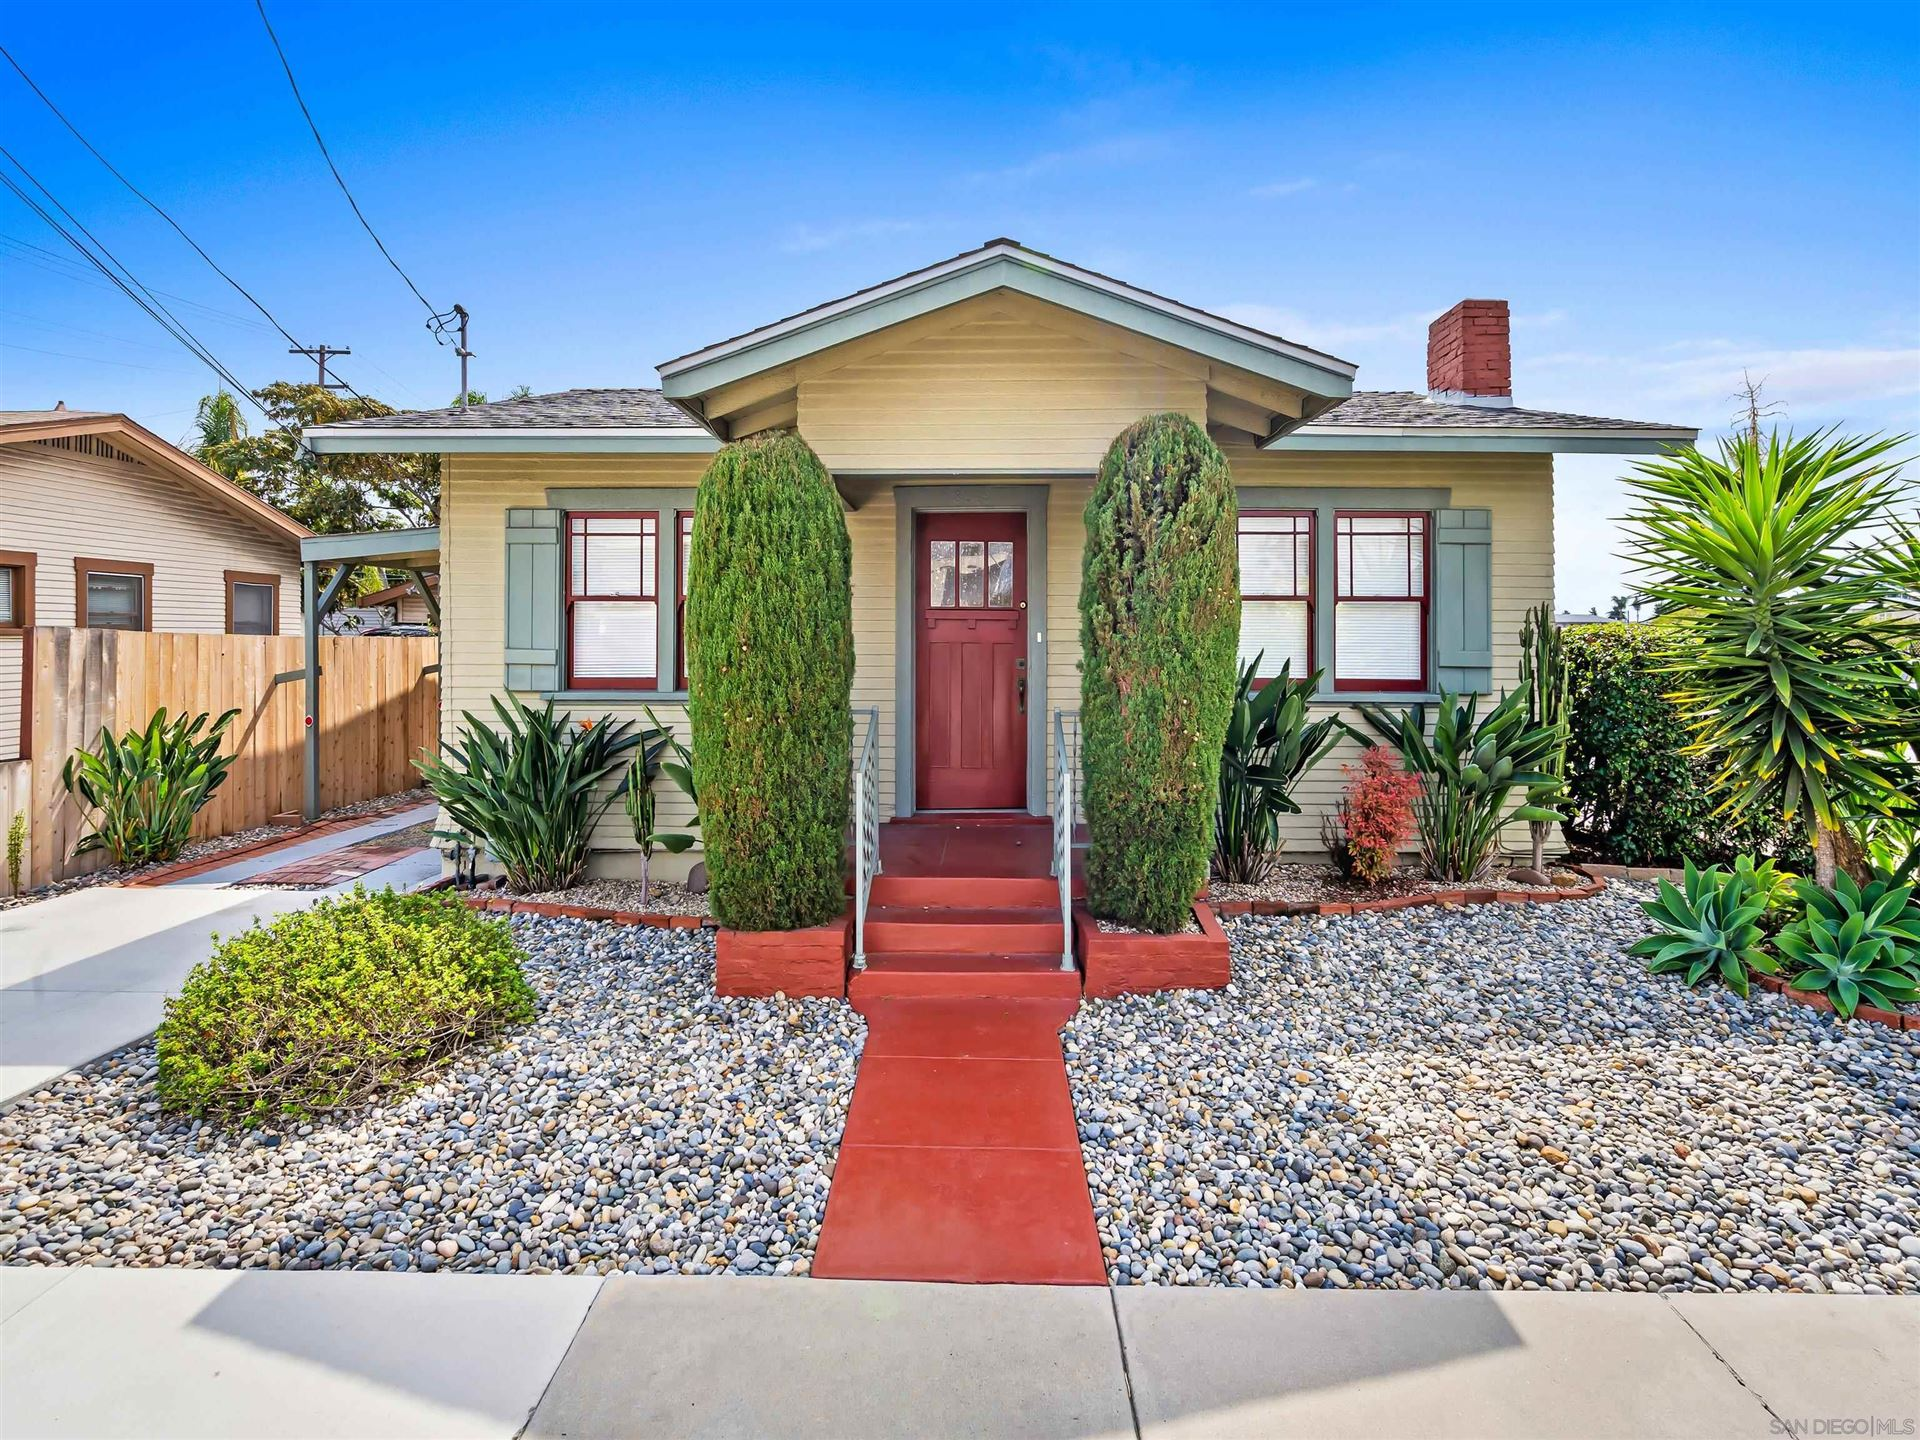 Photo for 3149 Madison Avenue, San Diego, CA 92116 (MLS # 210028335)